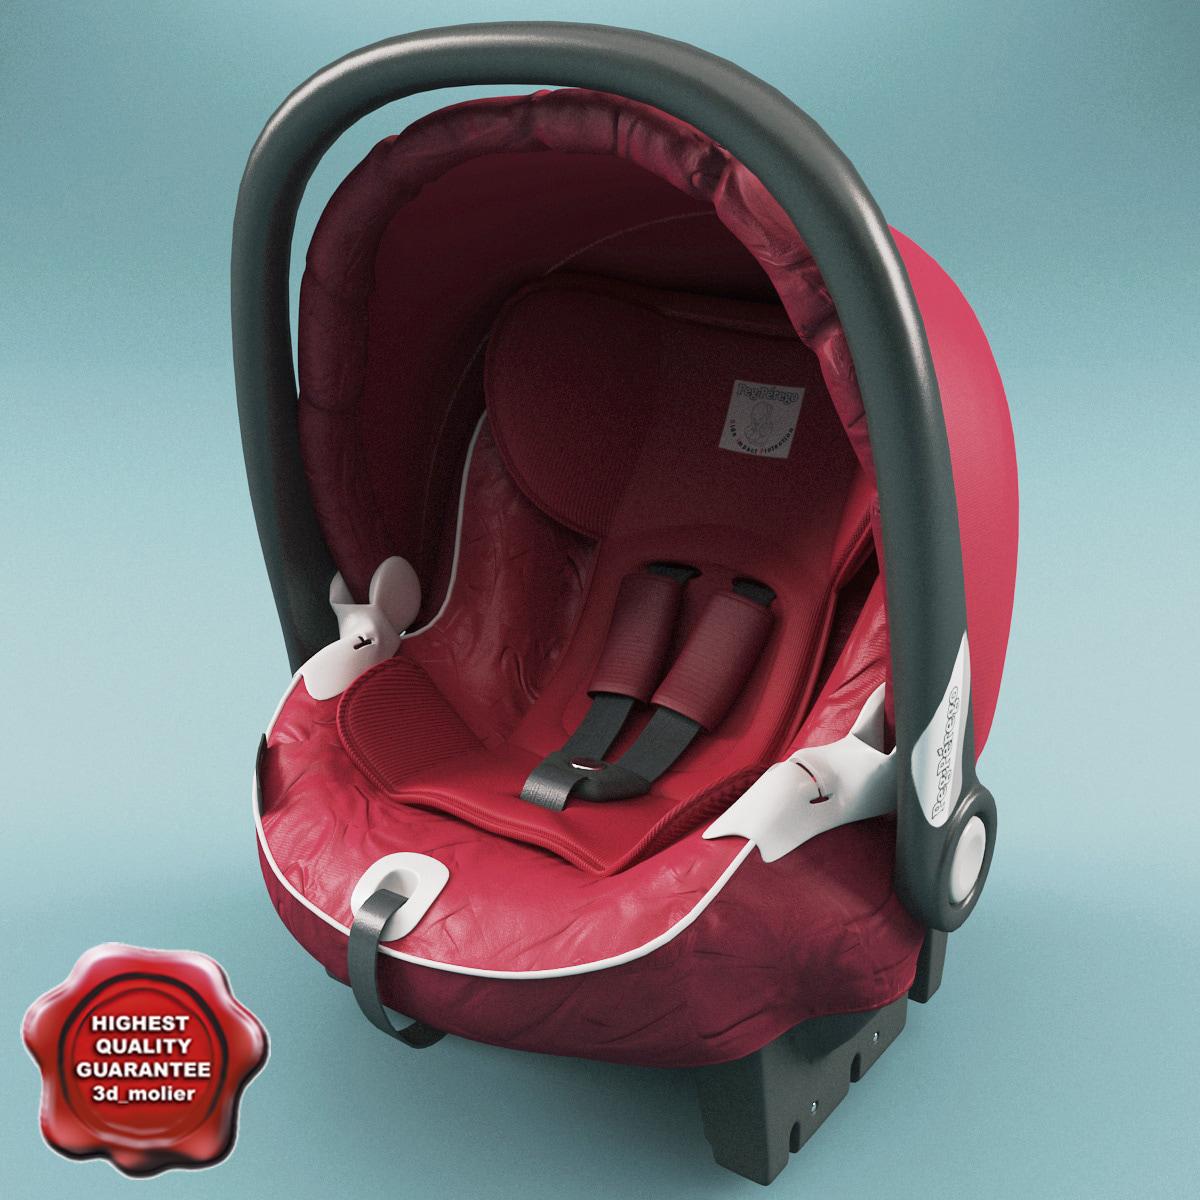 Infant_Car_Seat_Peg_Perego_00.jpg